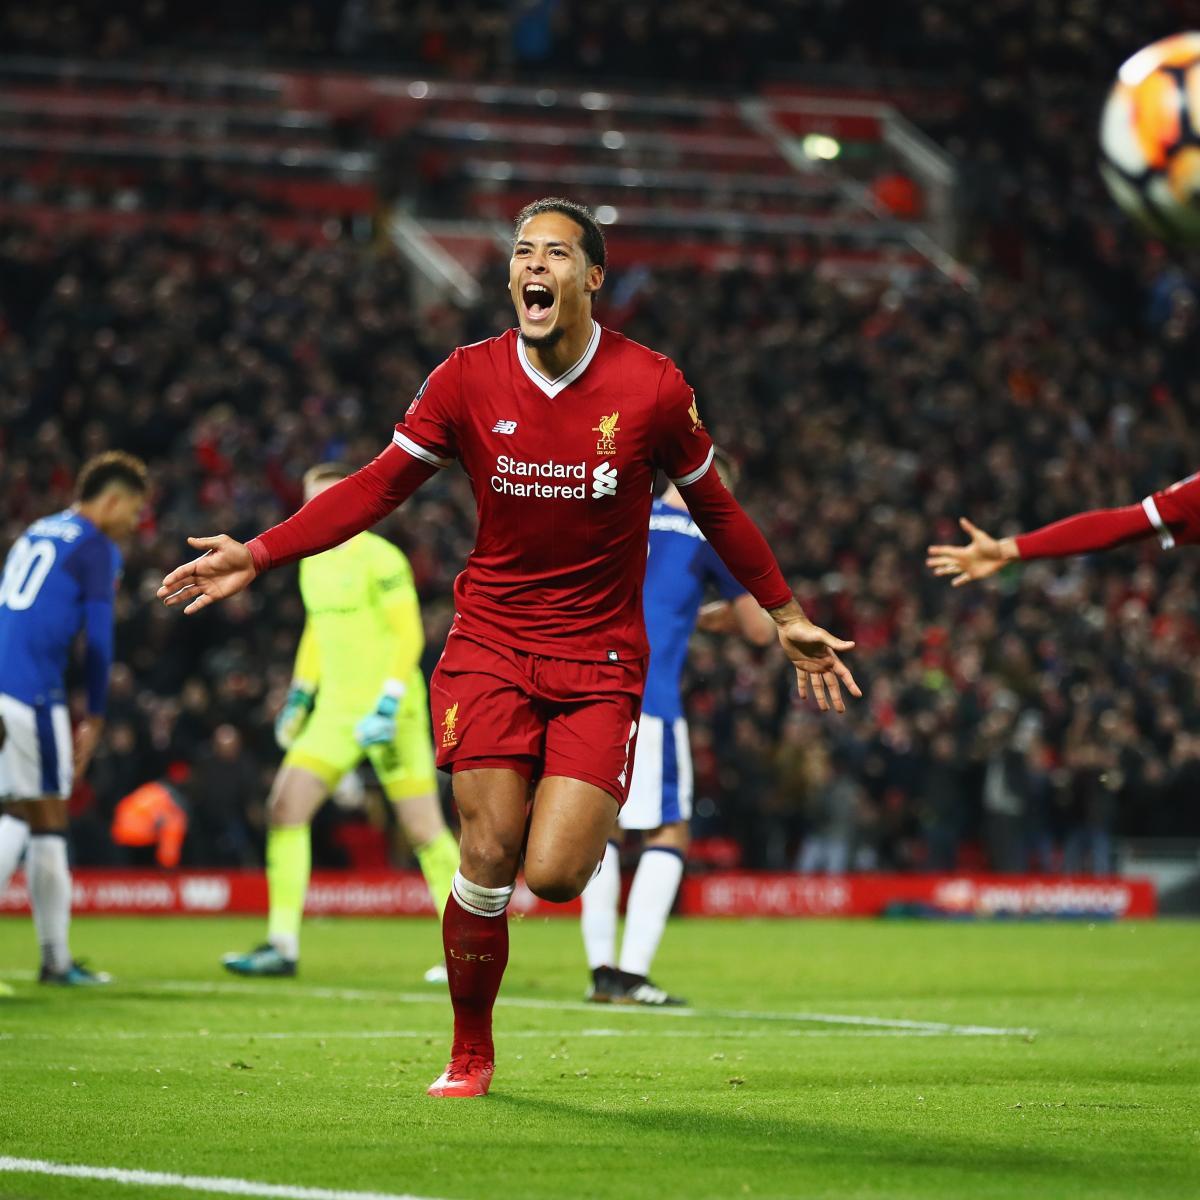 Live Streaming Soccer News Liverpool Vs Benfica Live: Everton Vs. Liverpool: Team News, Preview, Live Stream, TV